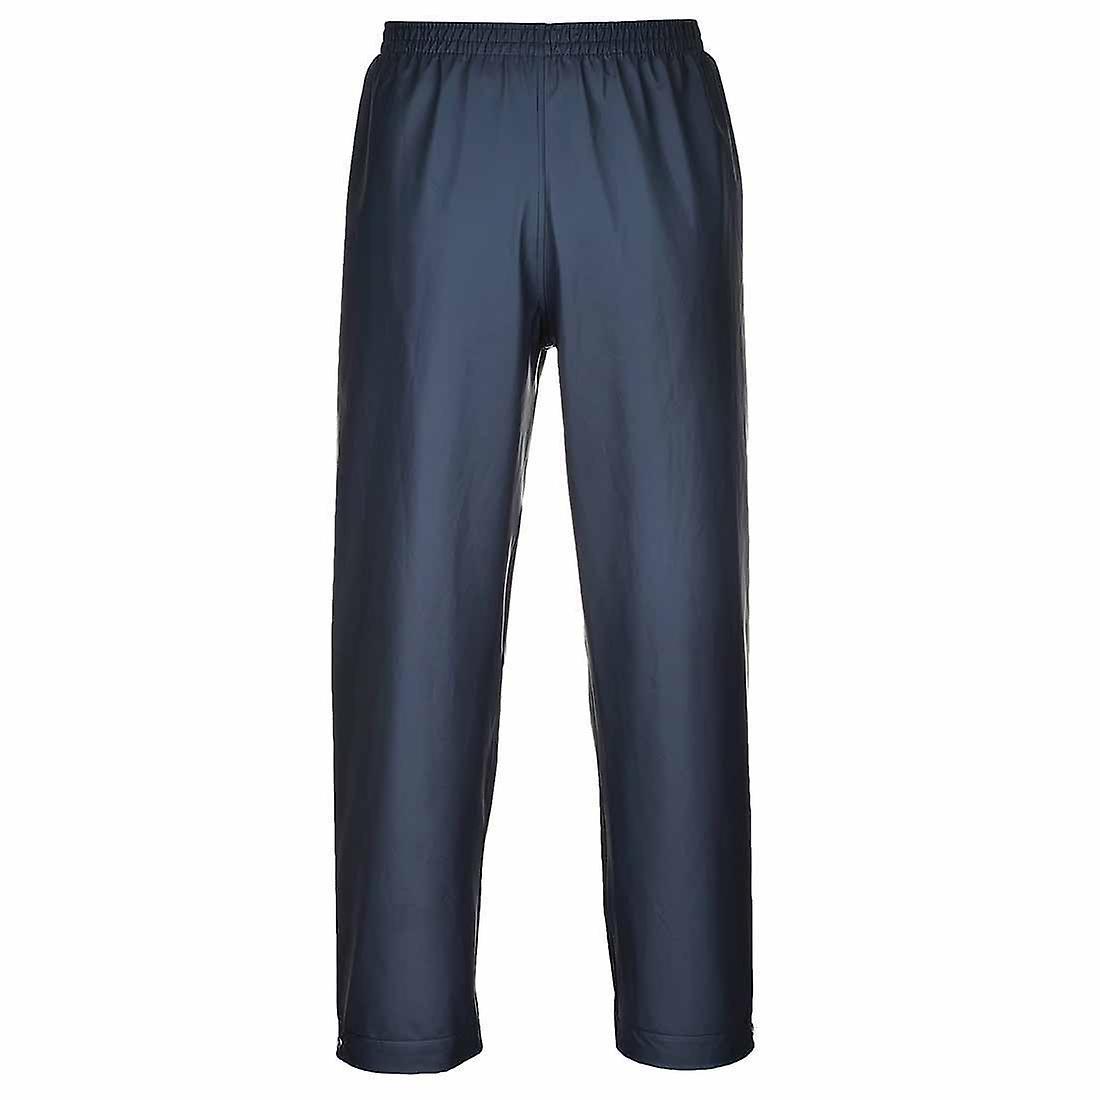 Portwest - Sealtex Ocean Rugged Waterproof Workwear Trouser